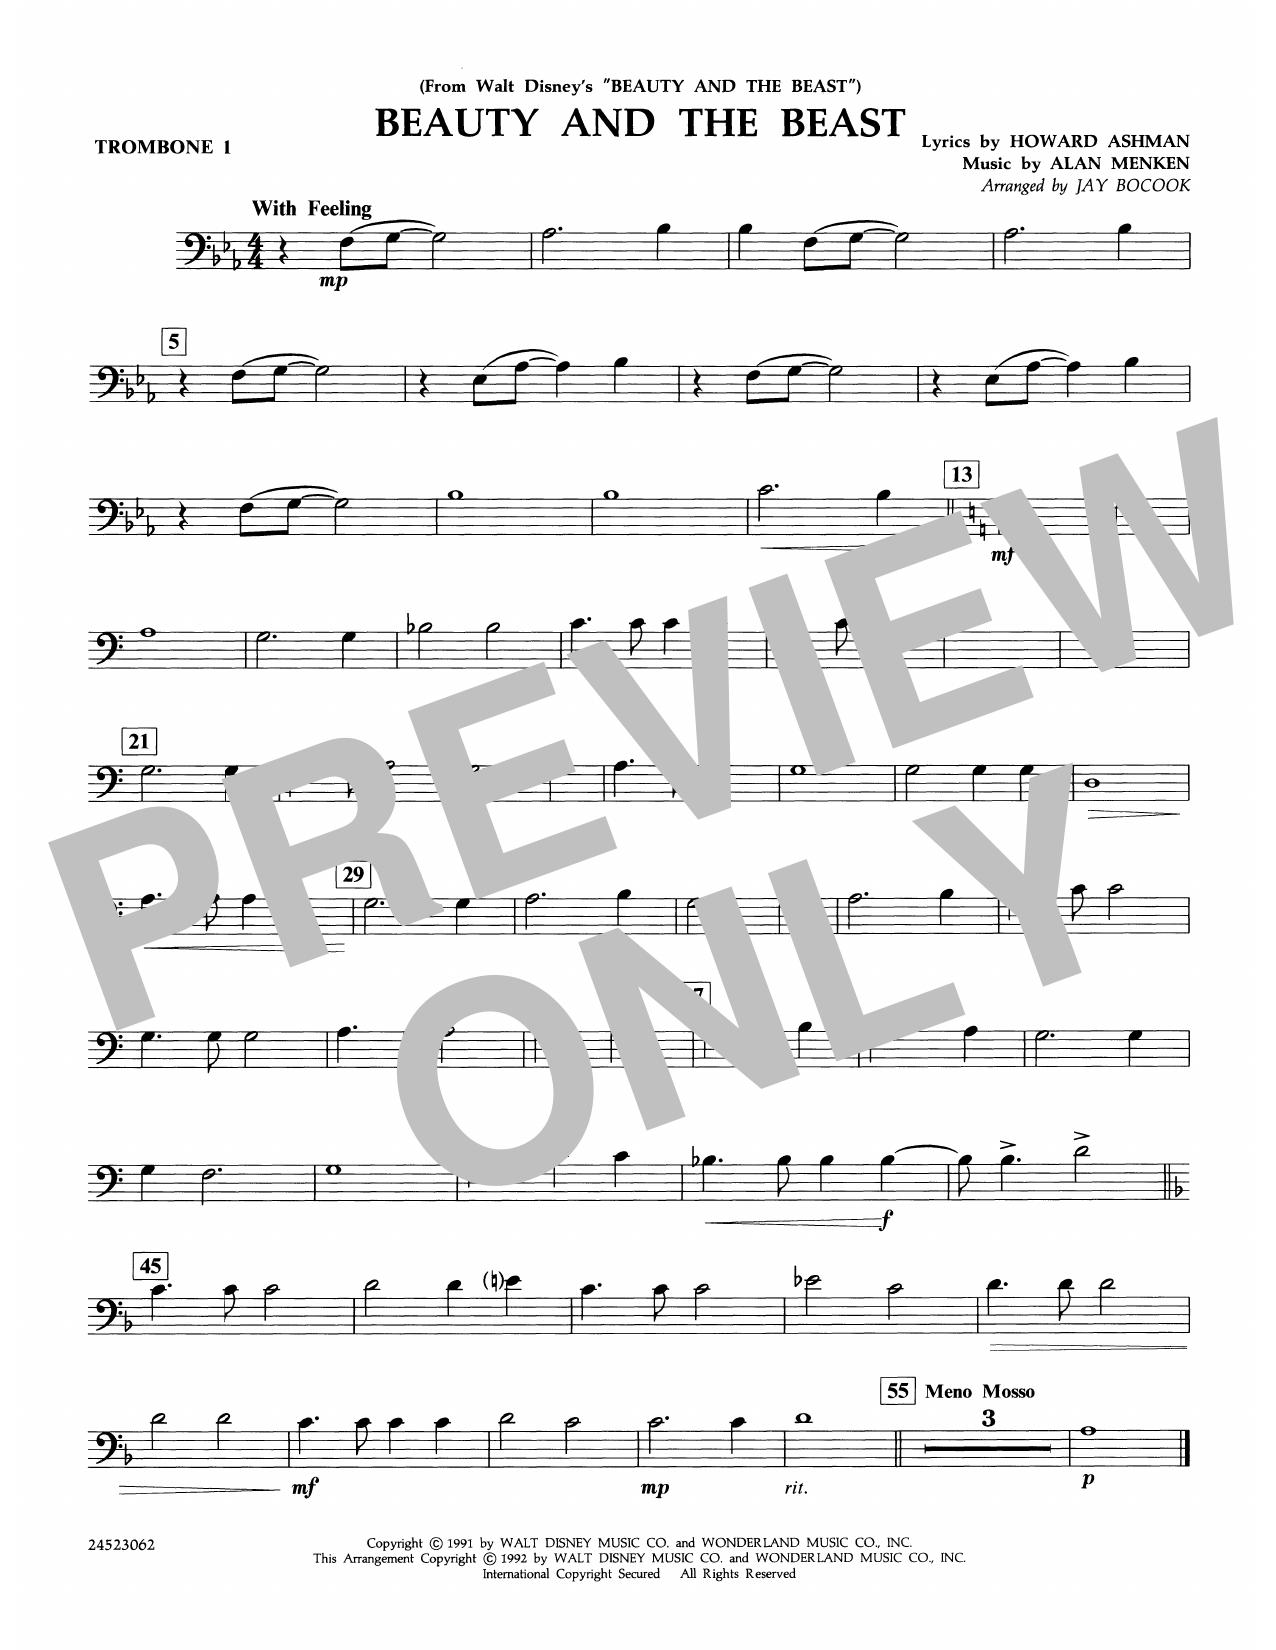 Beauty and the Beast - Trombone 1 Sheet Music